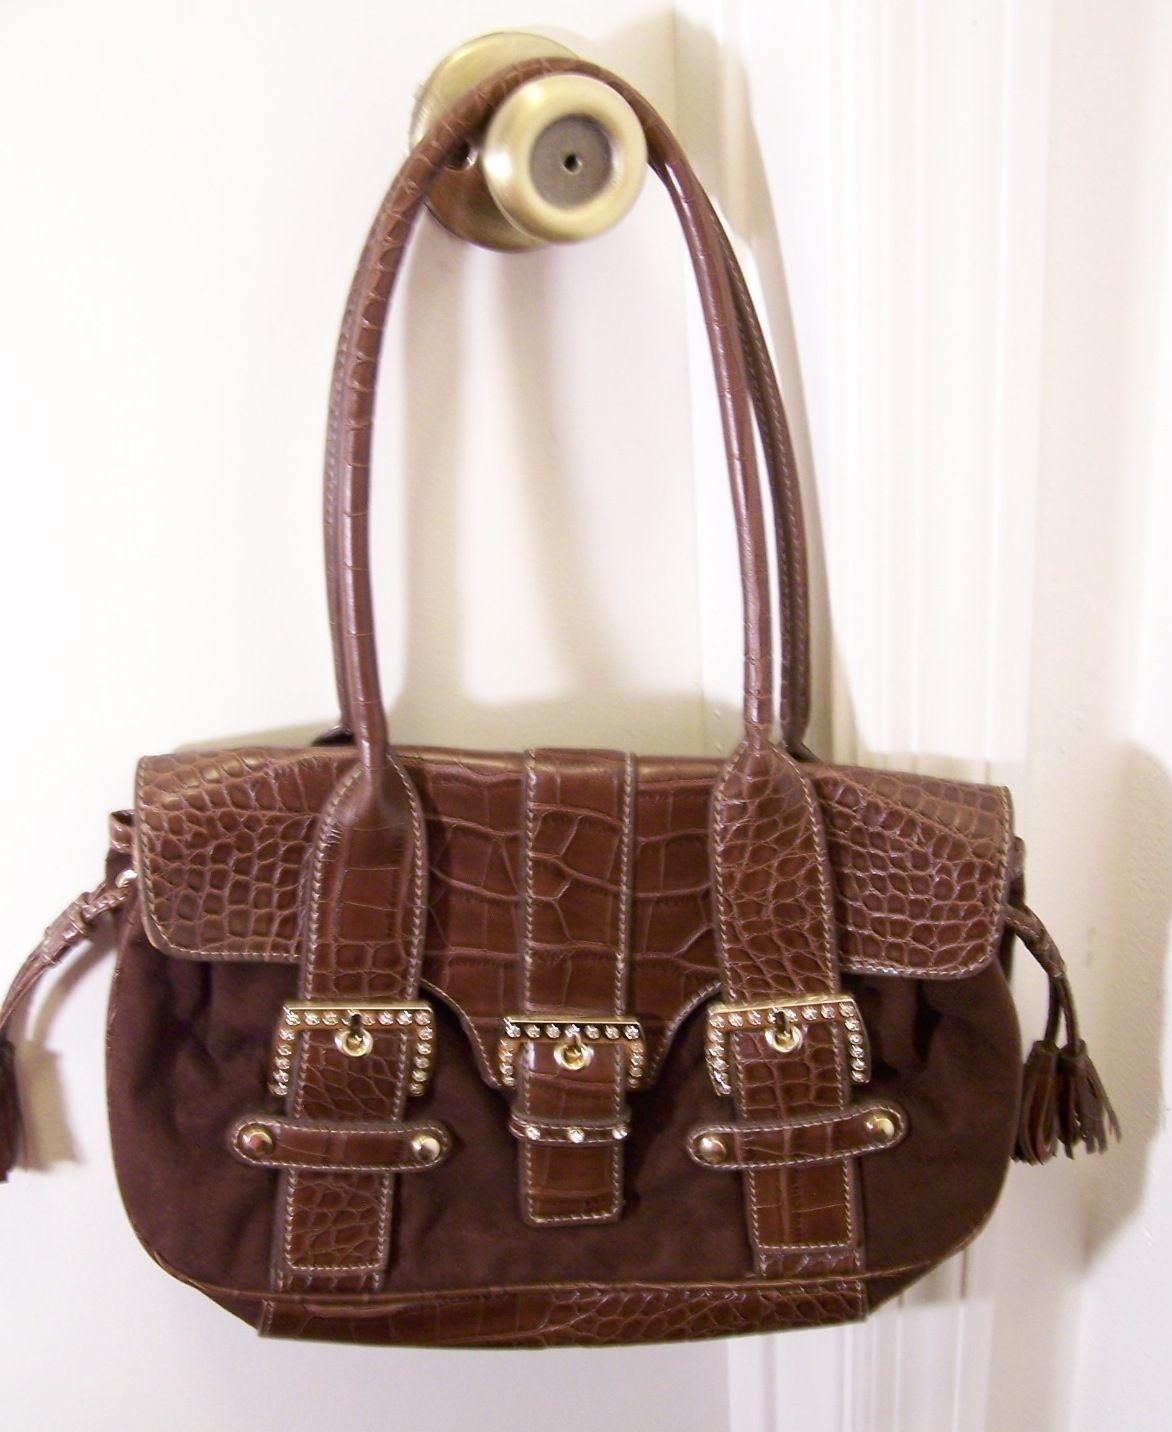 Kathy Van Zeeland Faux Croc Leather/Suede Strappy Brown Satchel Purse w/Buckles